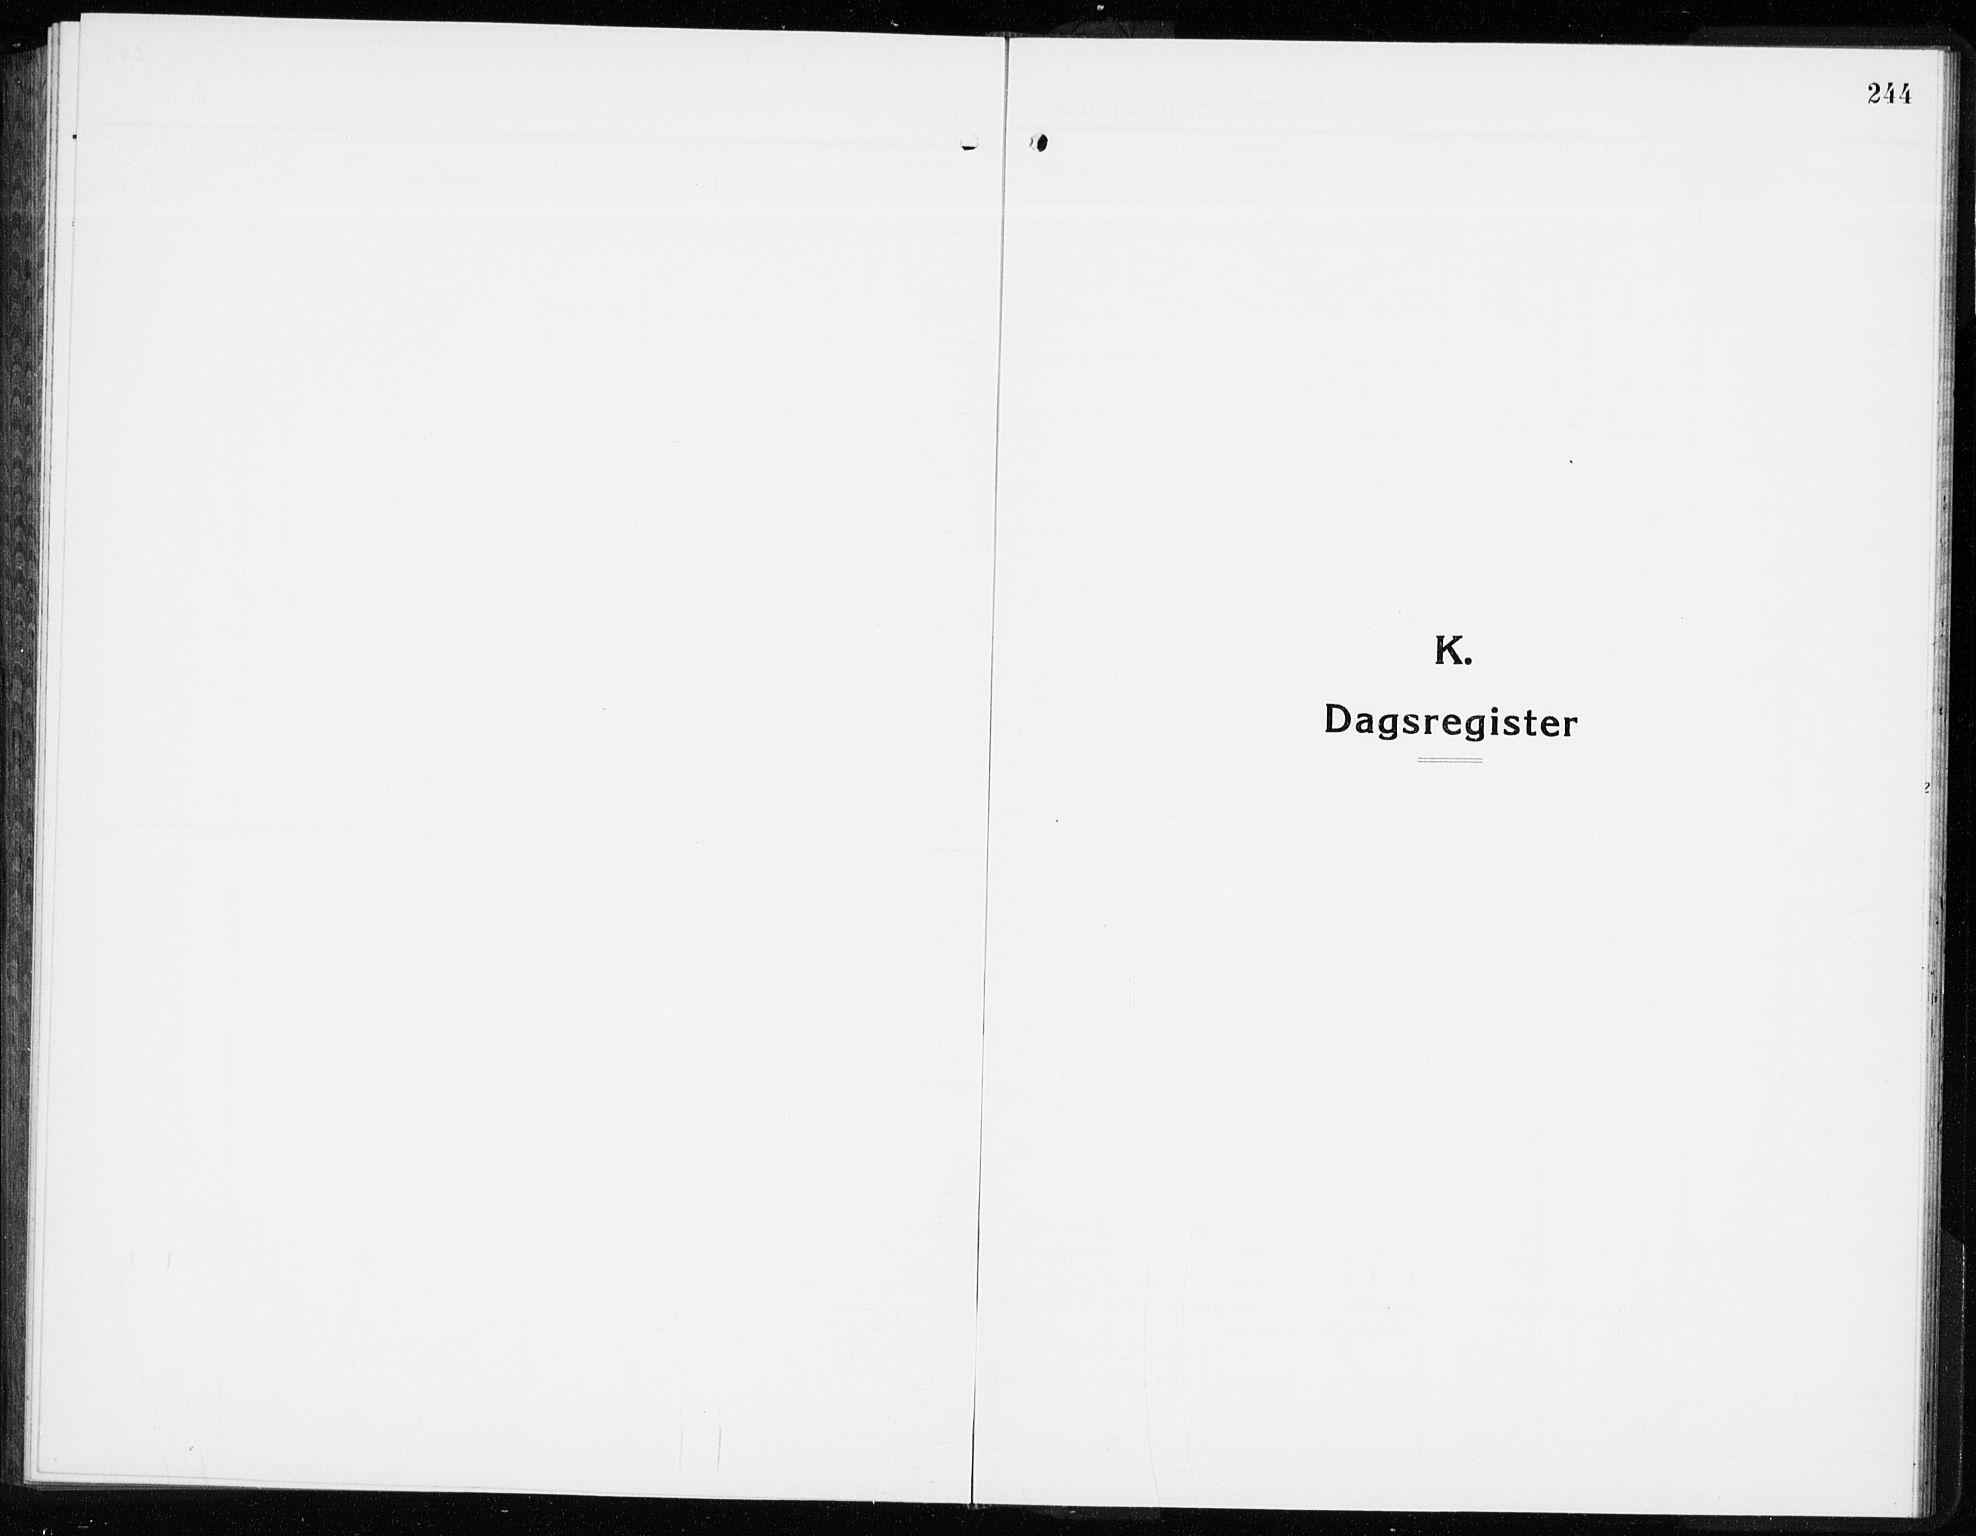 SAKO, Lier kirkebøker, G/Gb/L0005: Klokkerbok nr. II 5, 1932-1942, s. 244